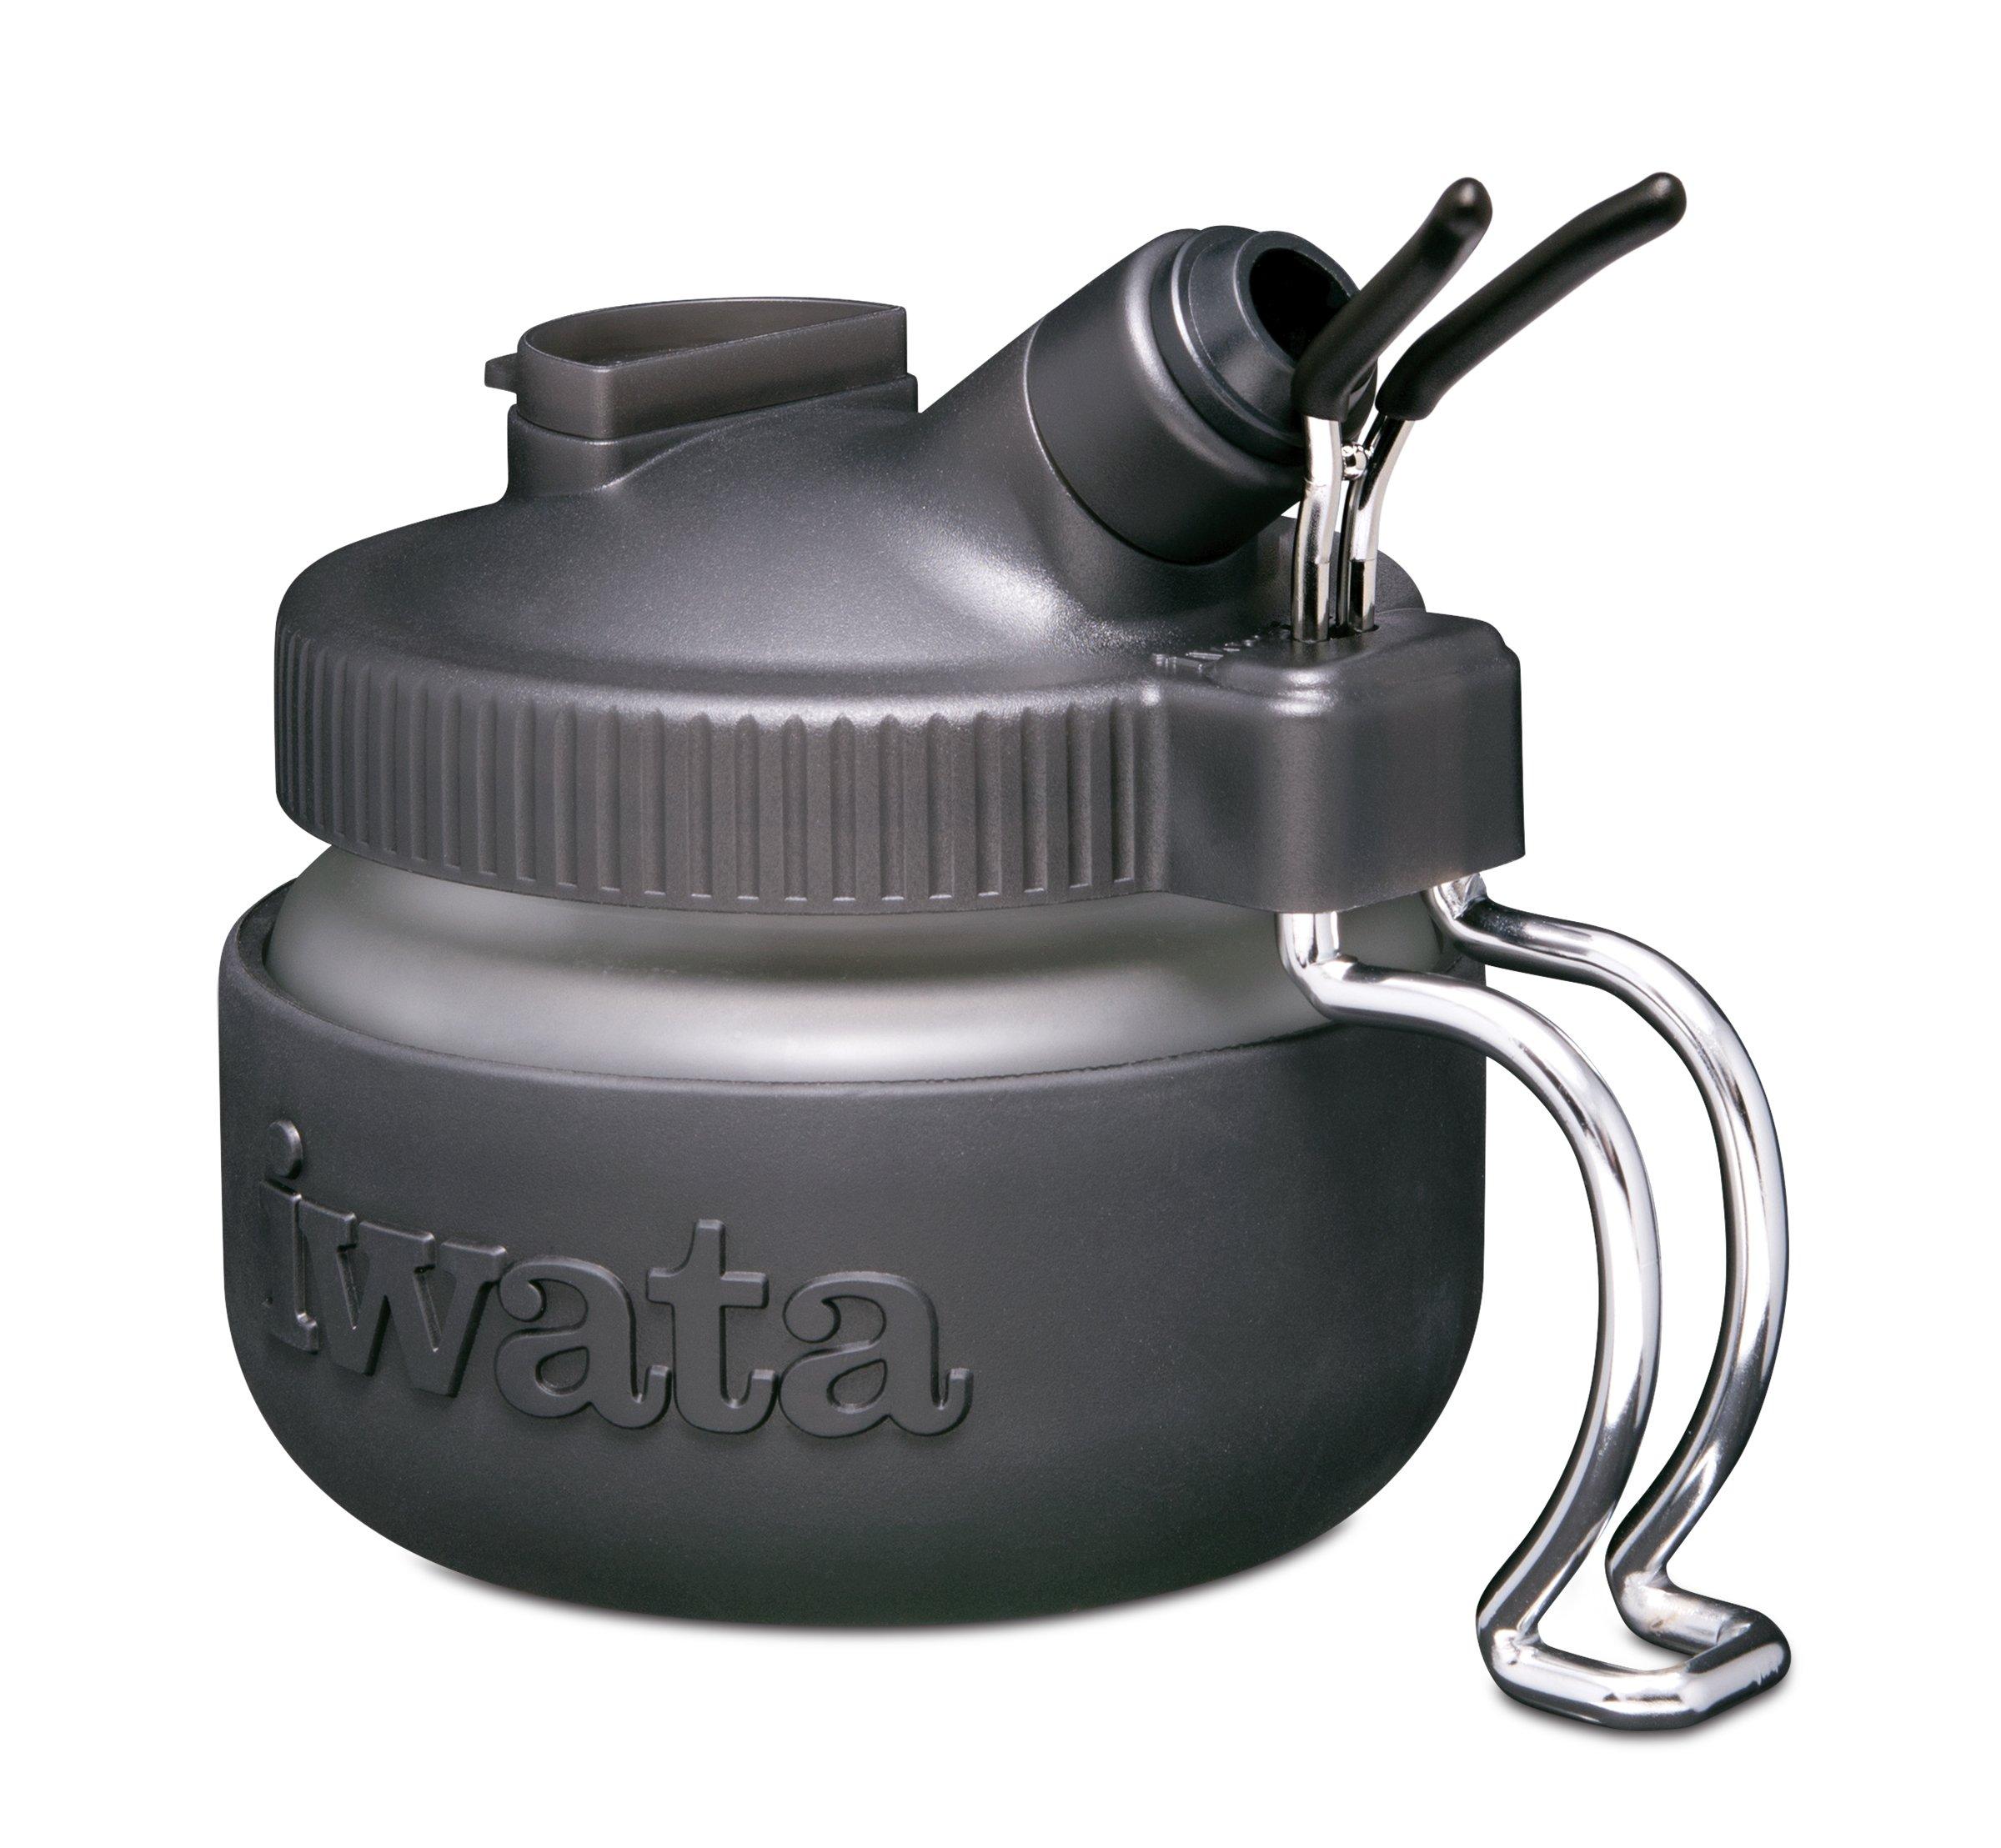 Iwata-Medea Universal Spray Out Pot by Iwata-Medea